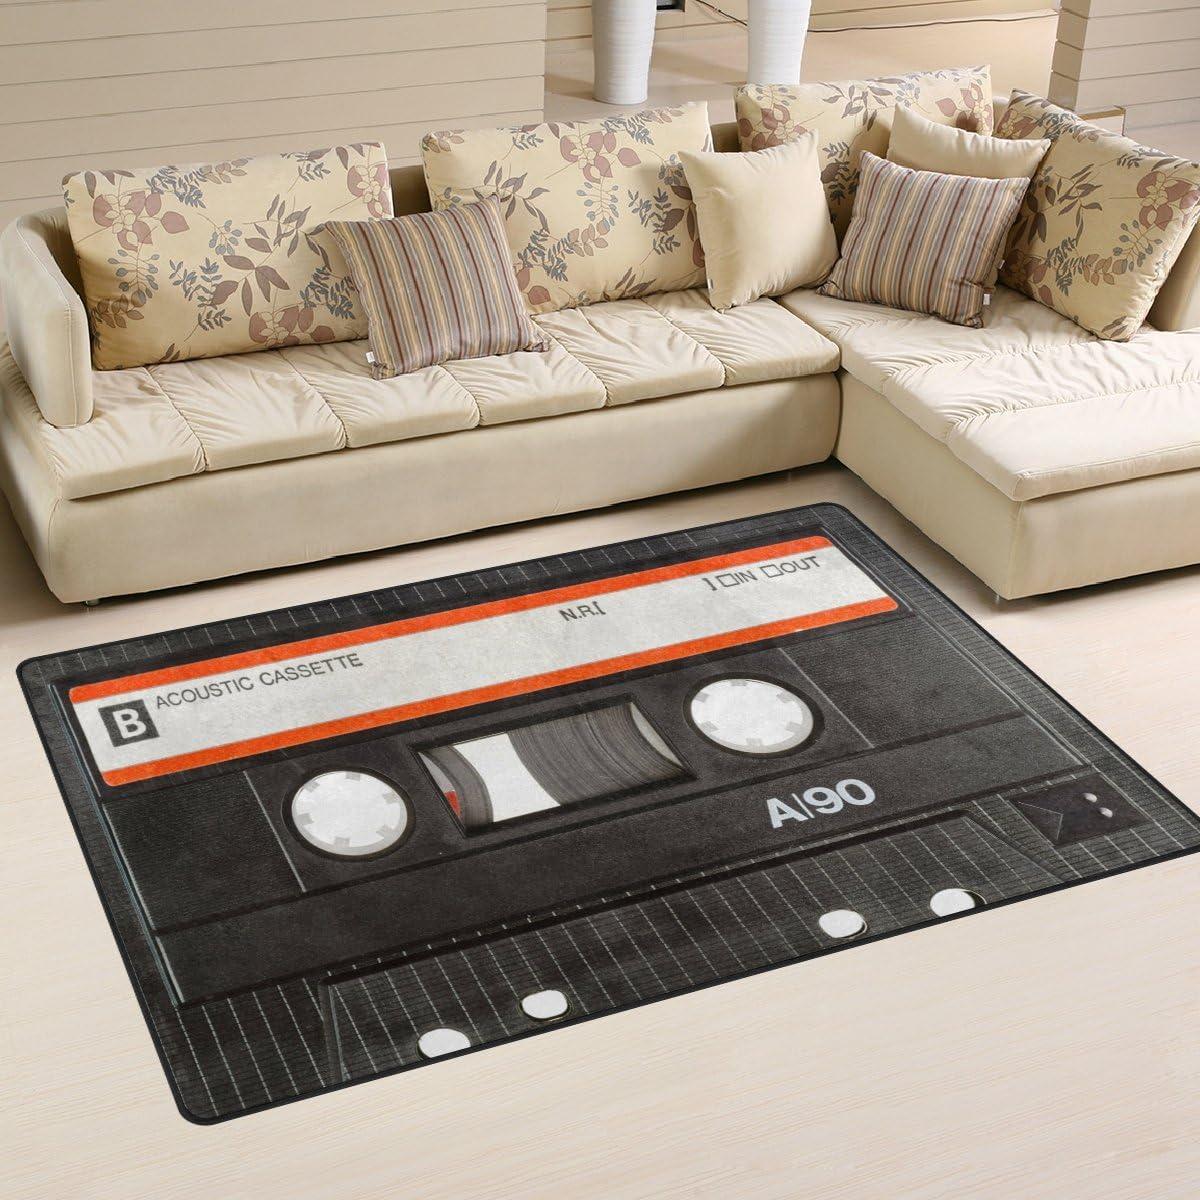 WOZO Old Cassette Tape Music Area Rug Rugs Non-Slip Floor Mat Doormat